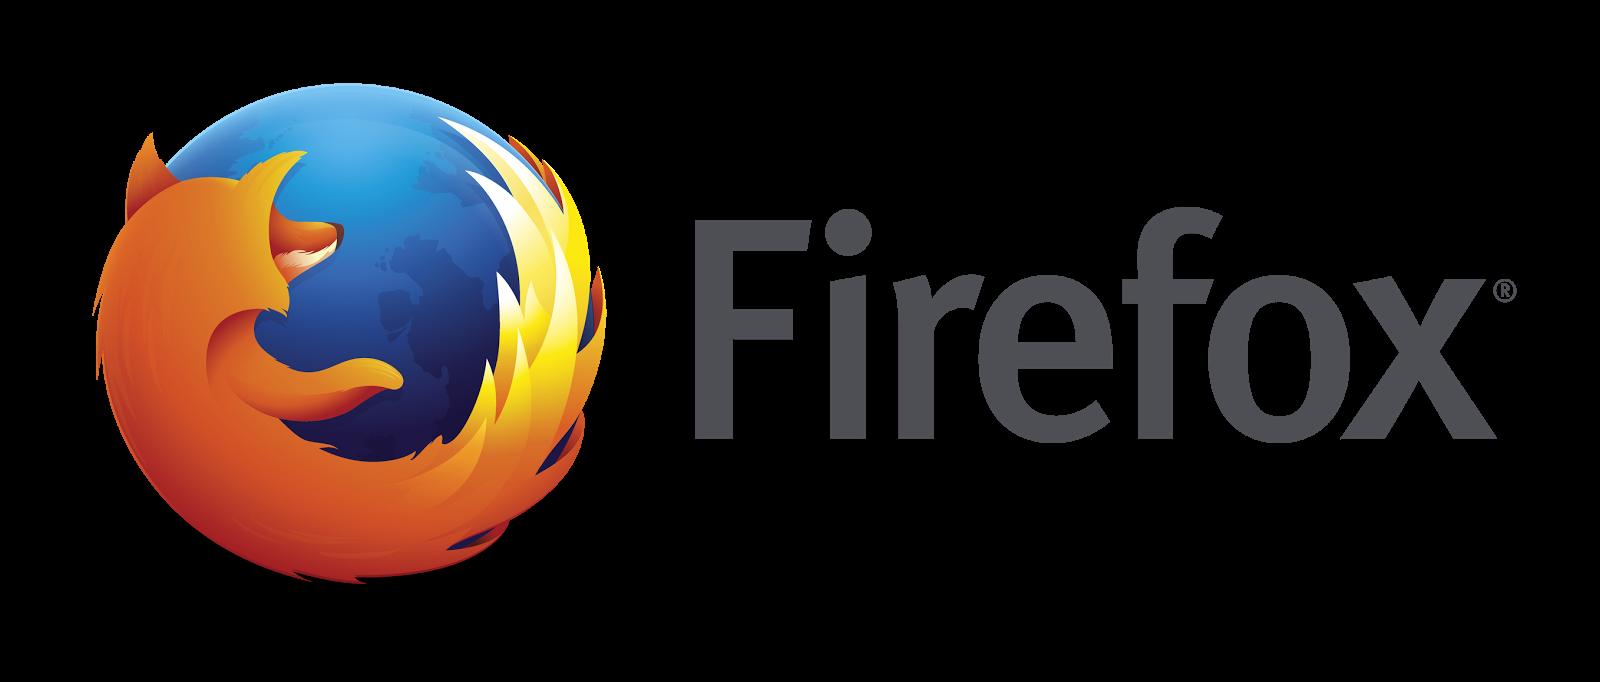 mozilla firefox 48.0 2 64 bit free download